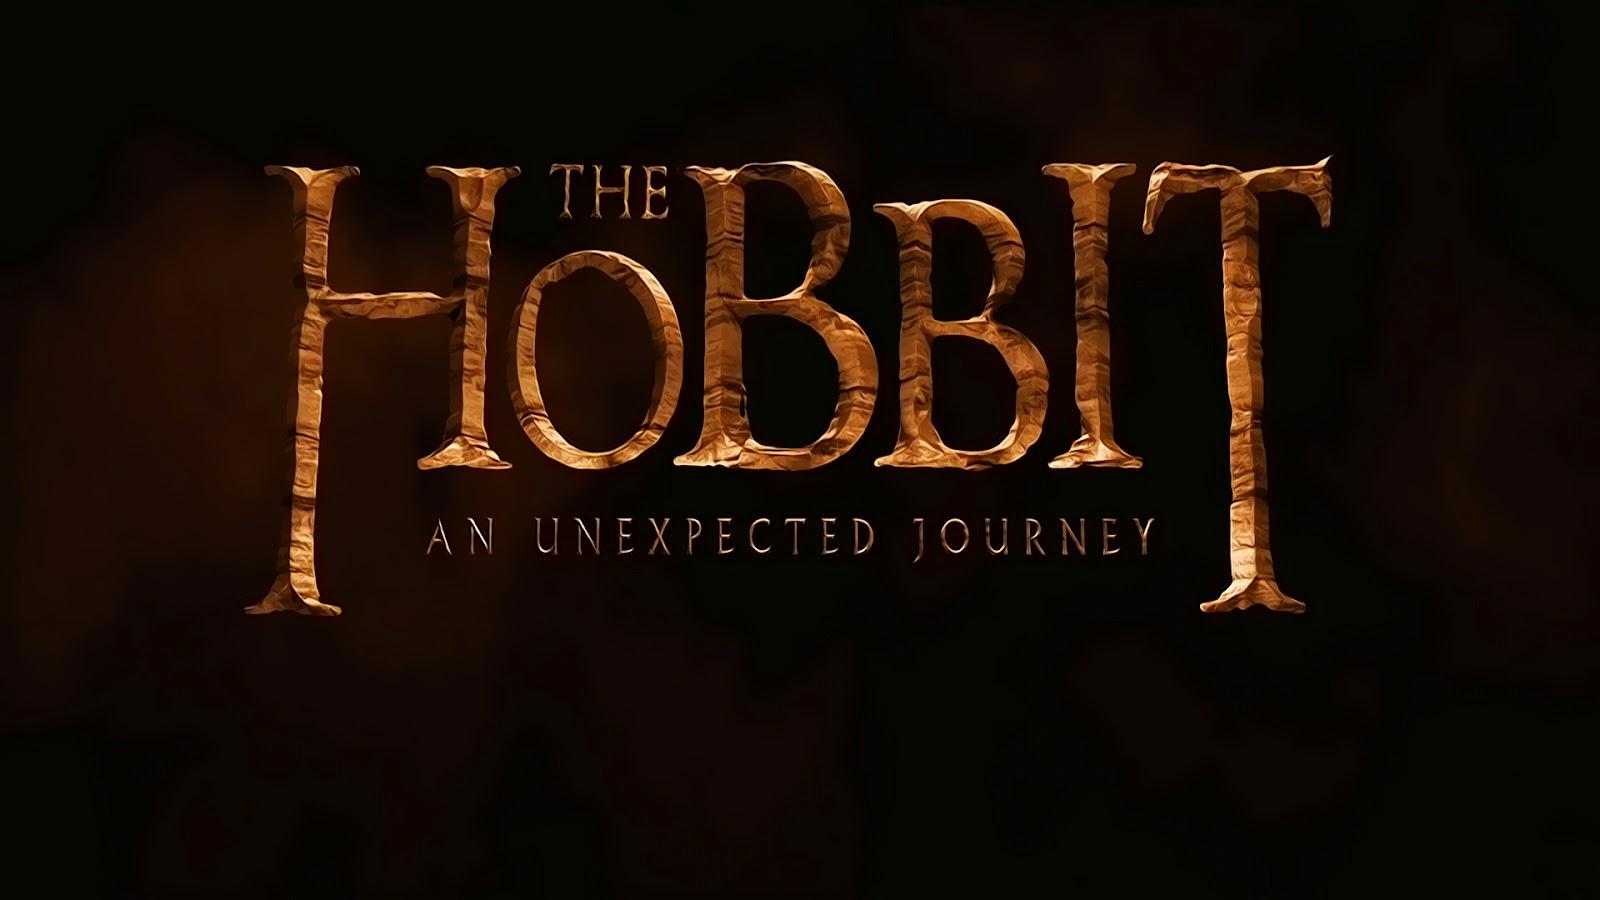 http://4.bp.blogspot.com/-xtjXvRgRkX8/UBMvYbhptBI/AAAAAAAADbY/4PF4KursQZo/s1600/The-Hobbit-An-Unexpected-Journey-Wallpapers-1920x1080-26.jpg